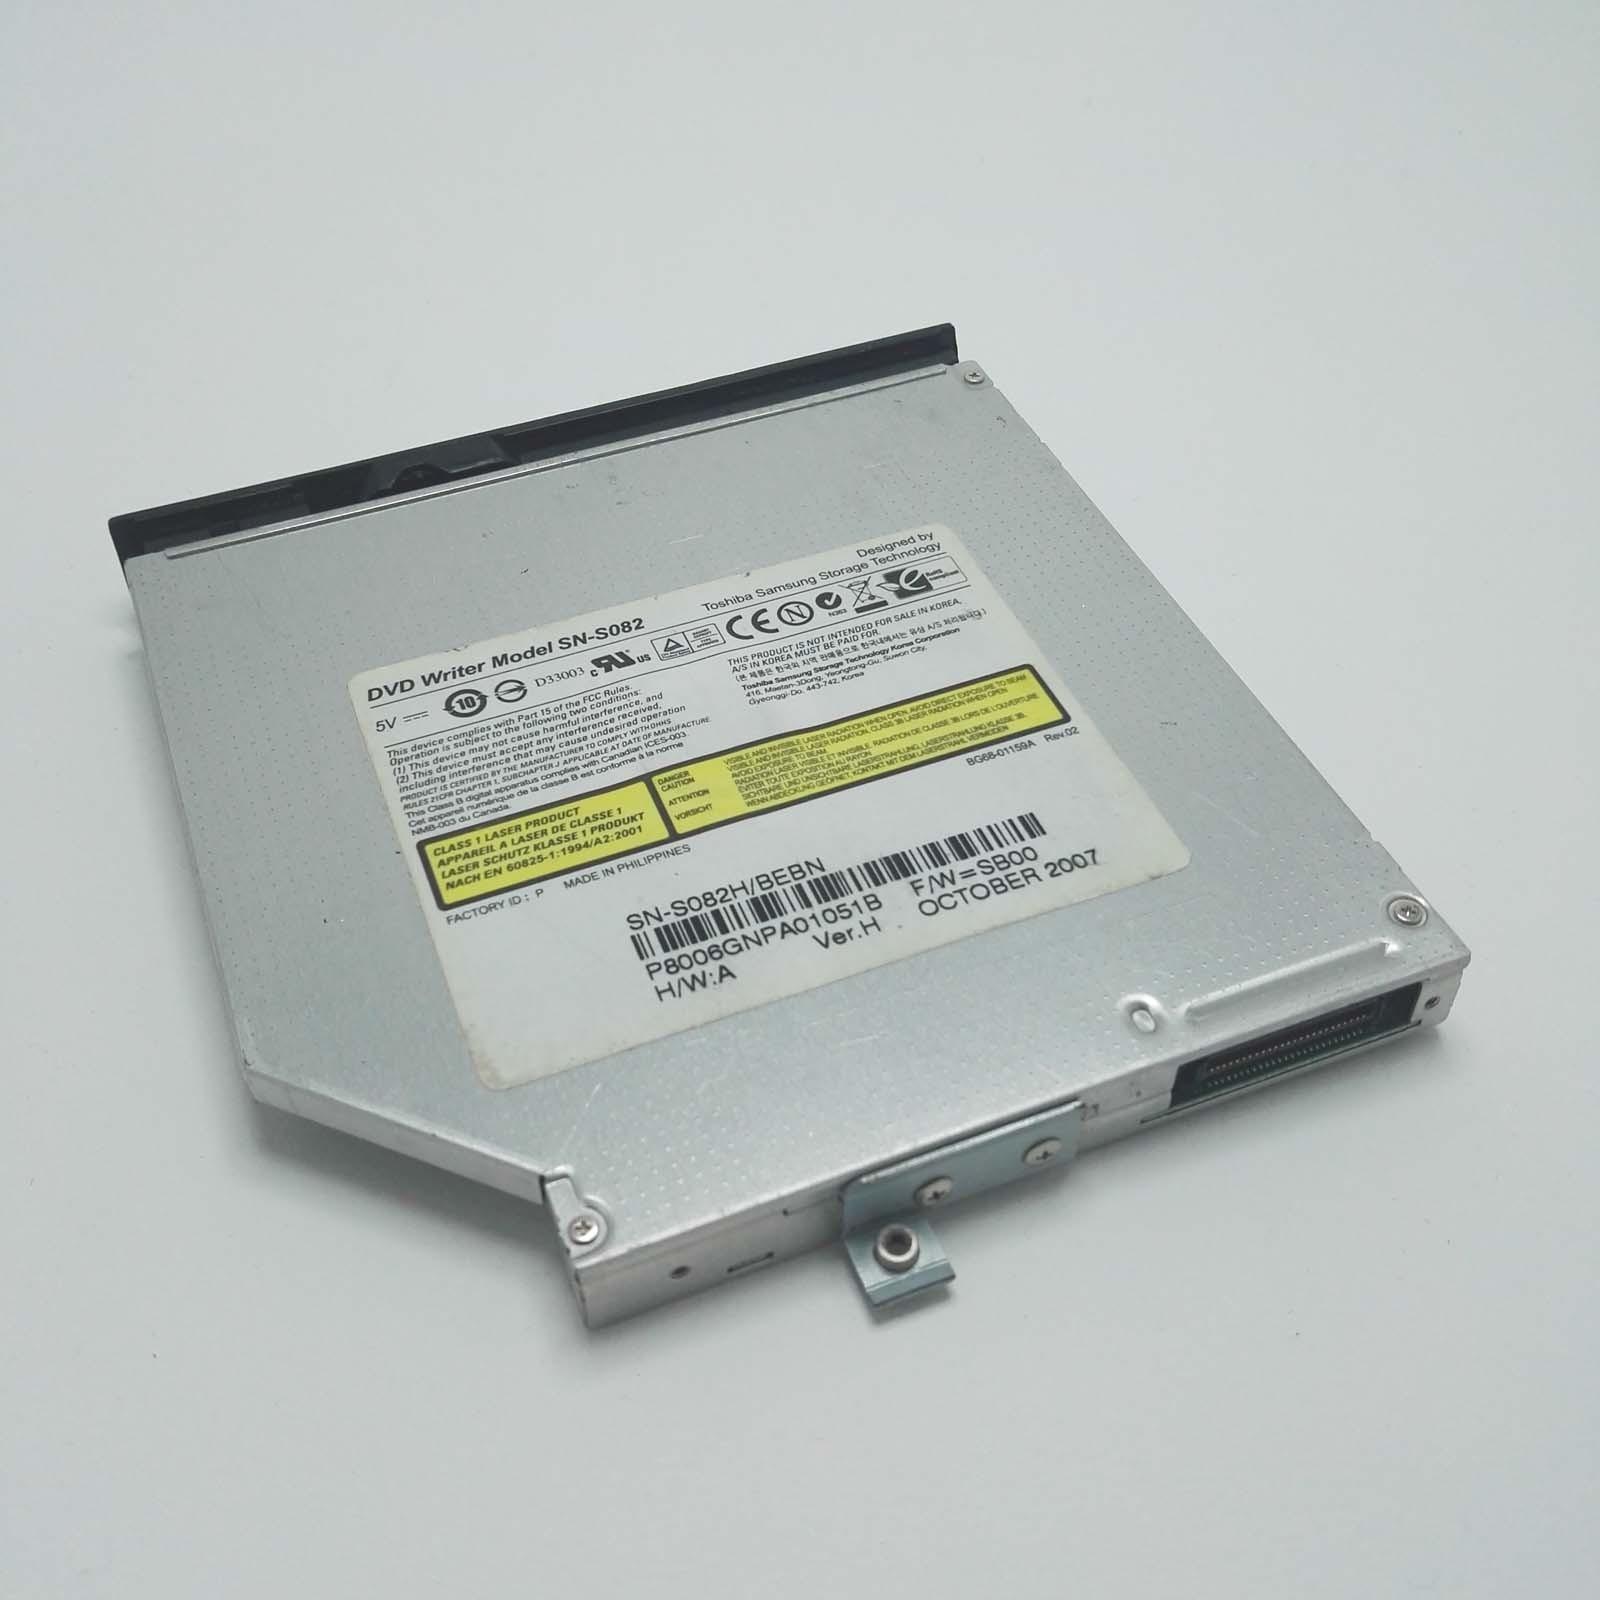 DVD Writer Model SN-S082 con mascherina Samsung R60 Plus NP-R60S